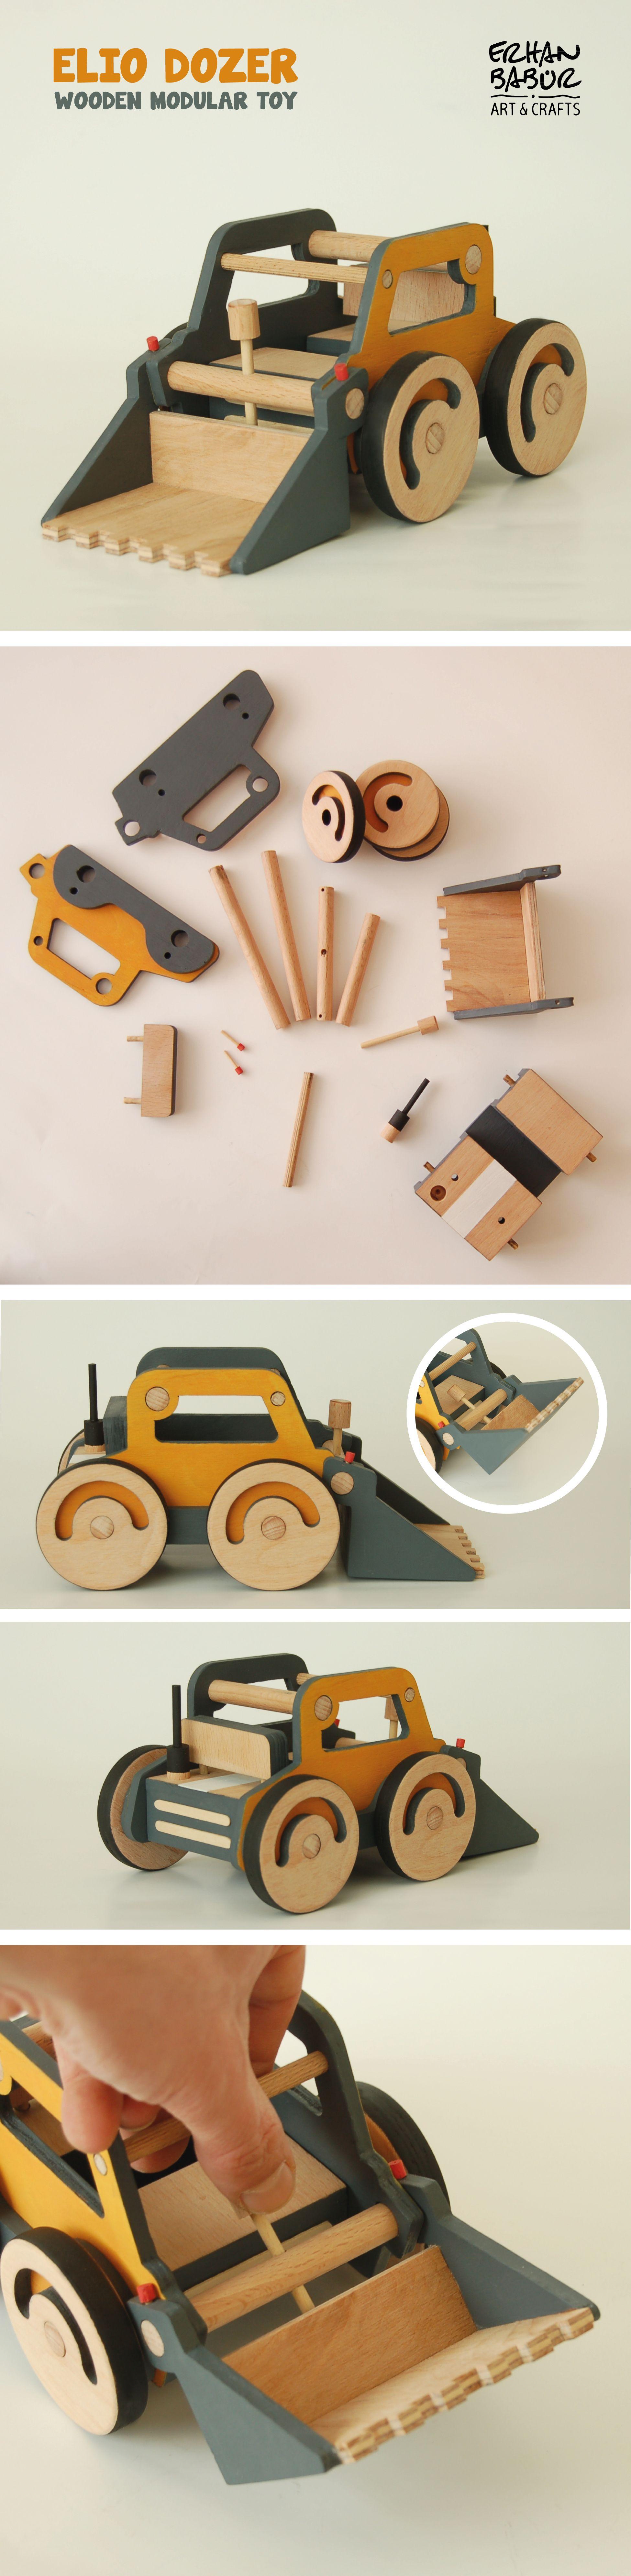 De Modular Elio ToyJuguetes Dozer Madera Pinterest Wooden yv8wnOP0mN